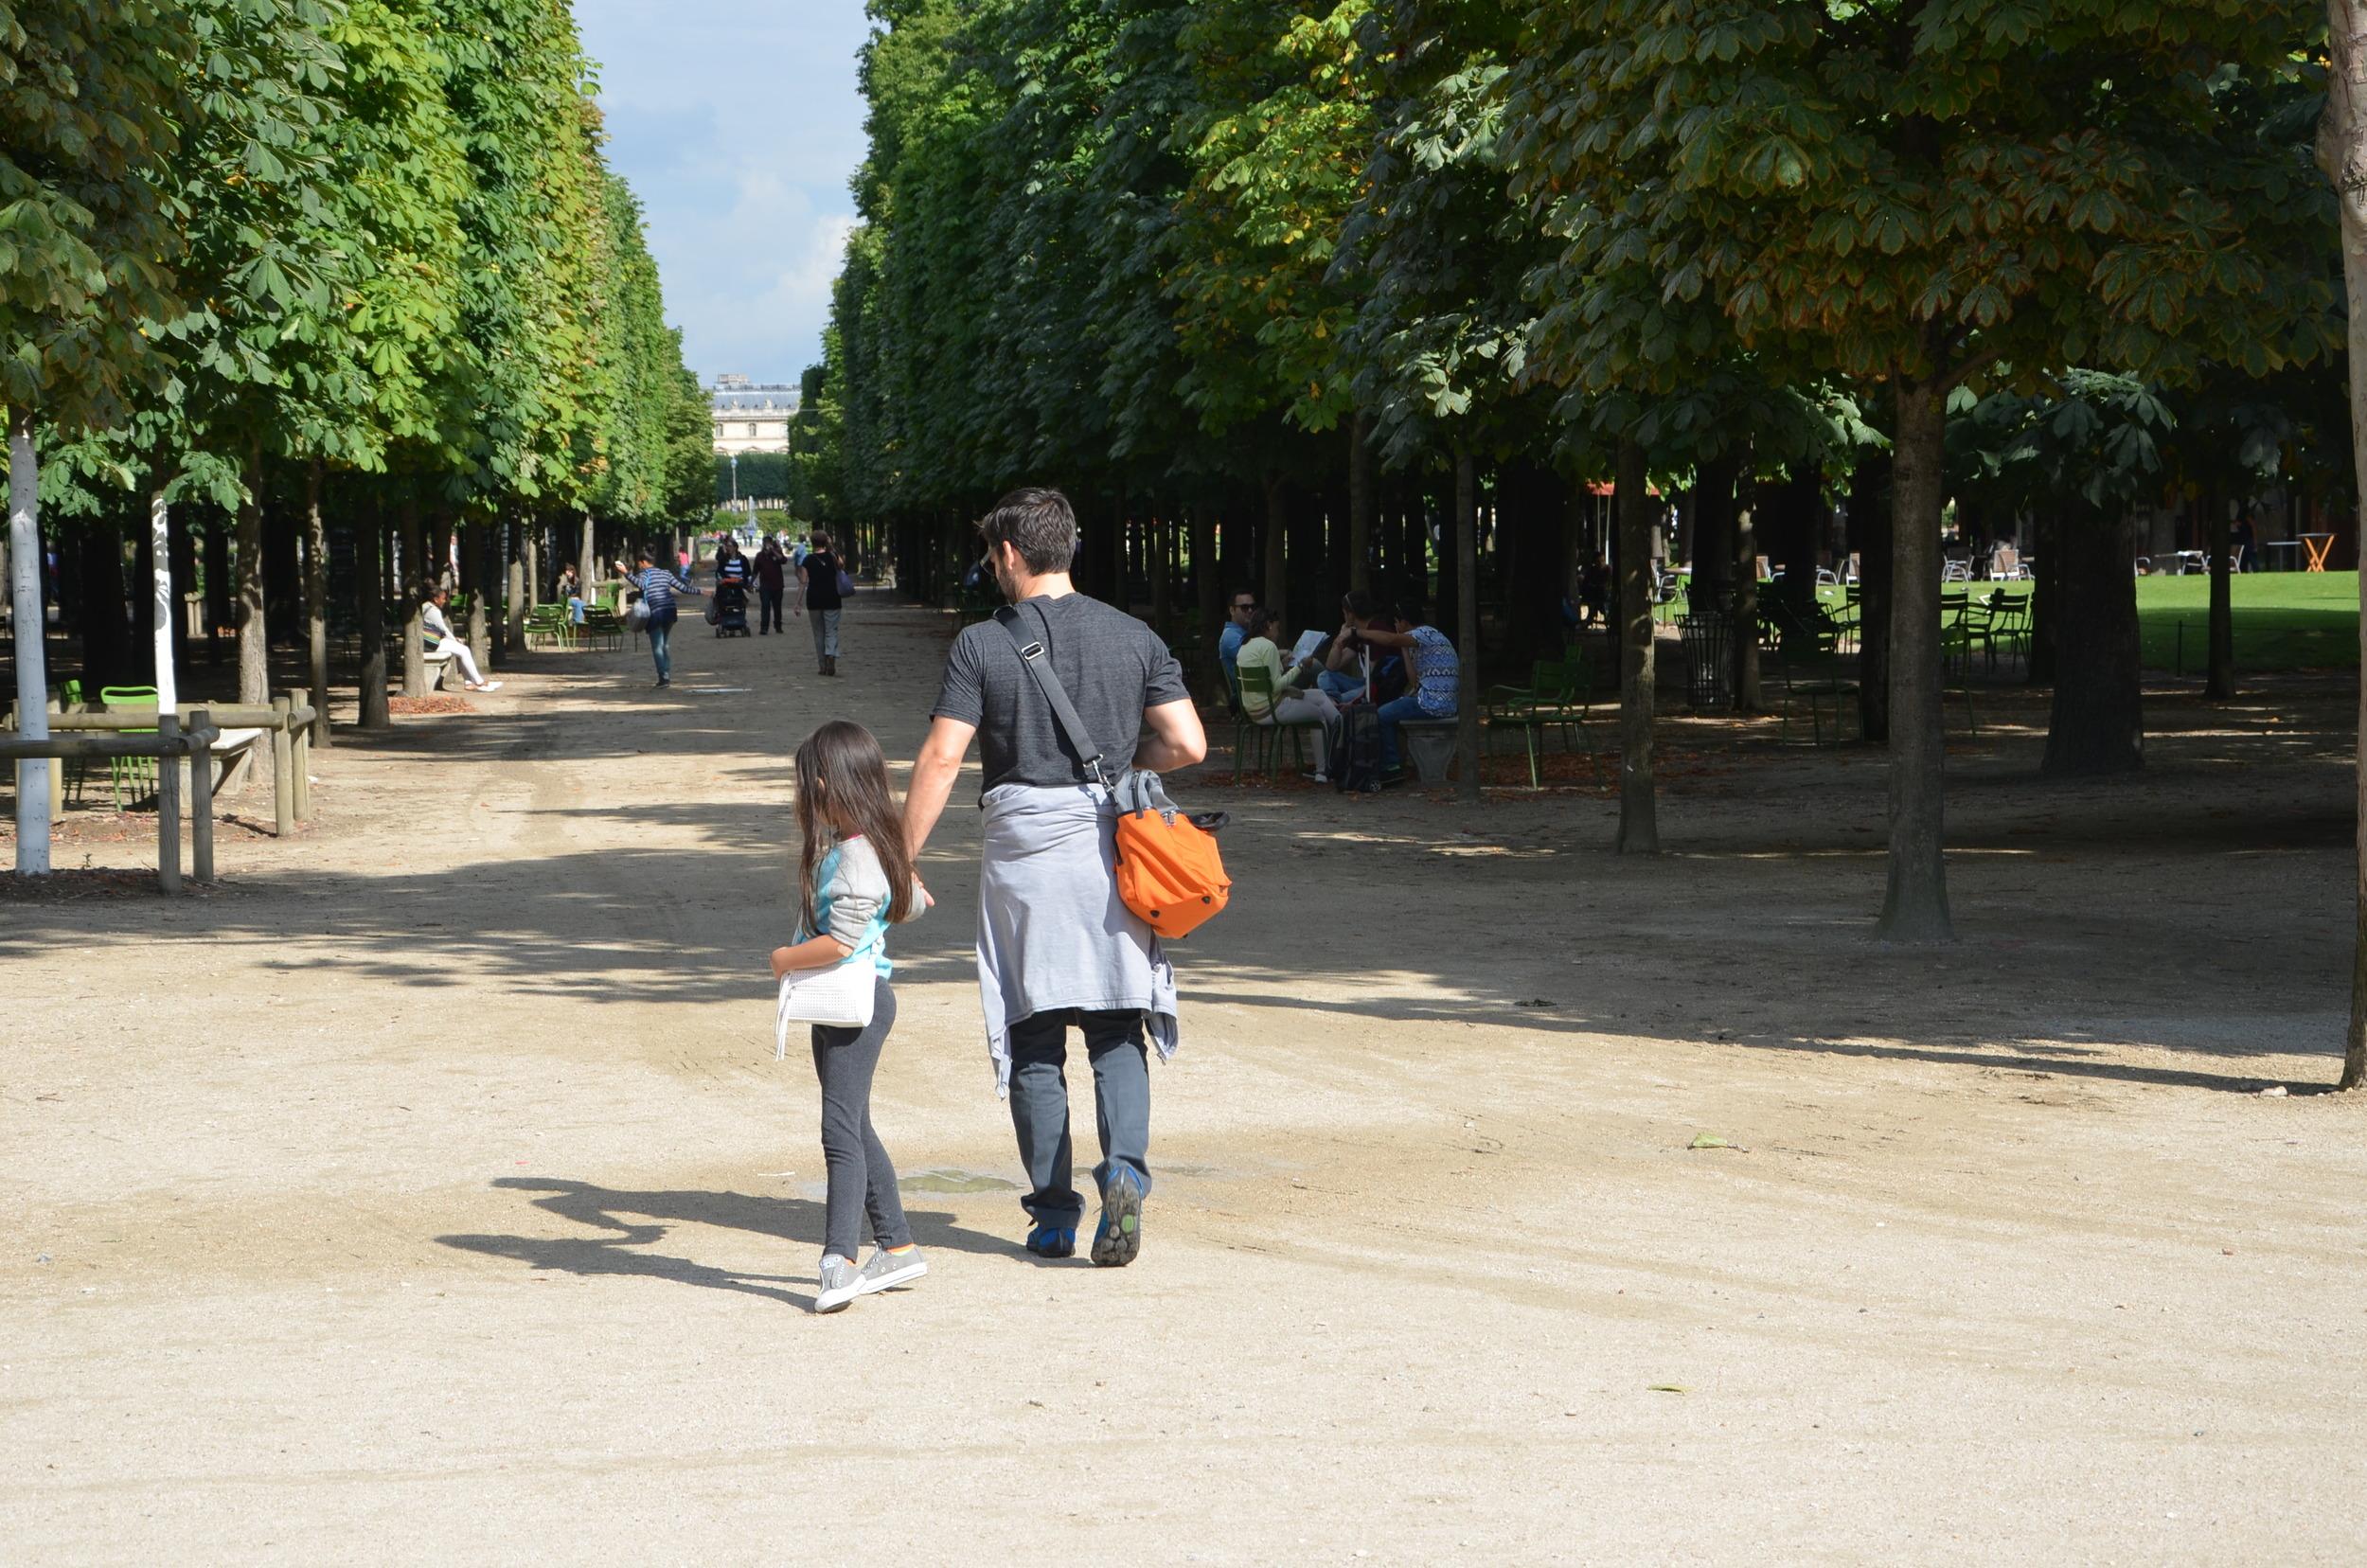 Exploring Paris gardens with my daughter